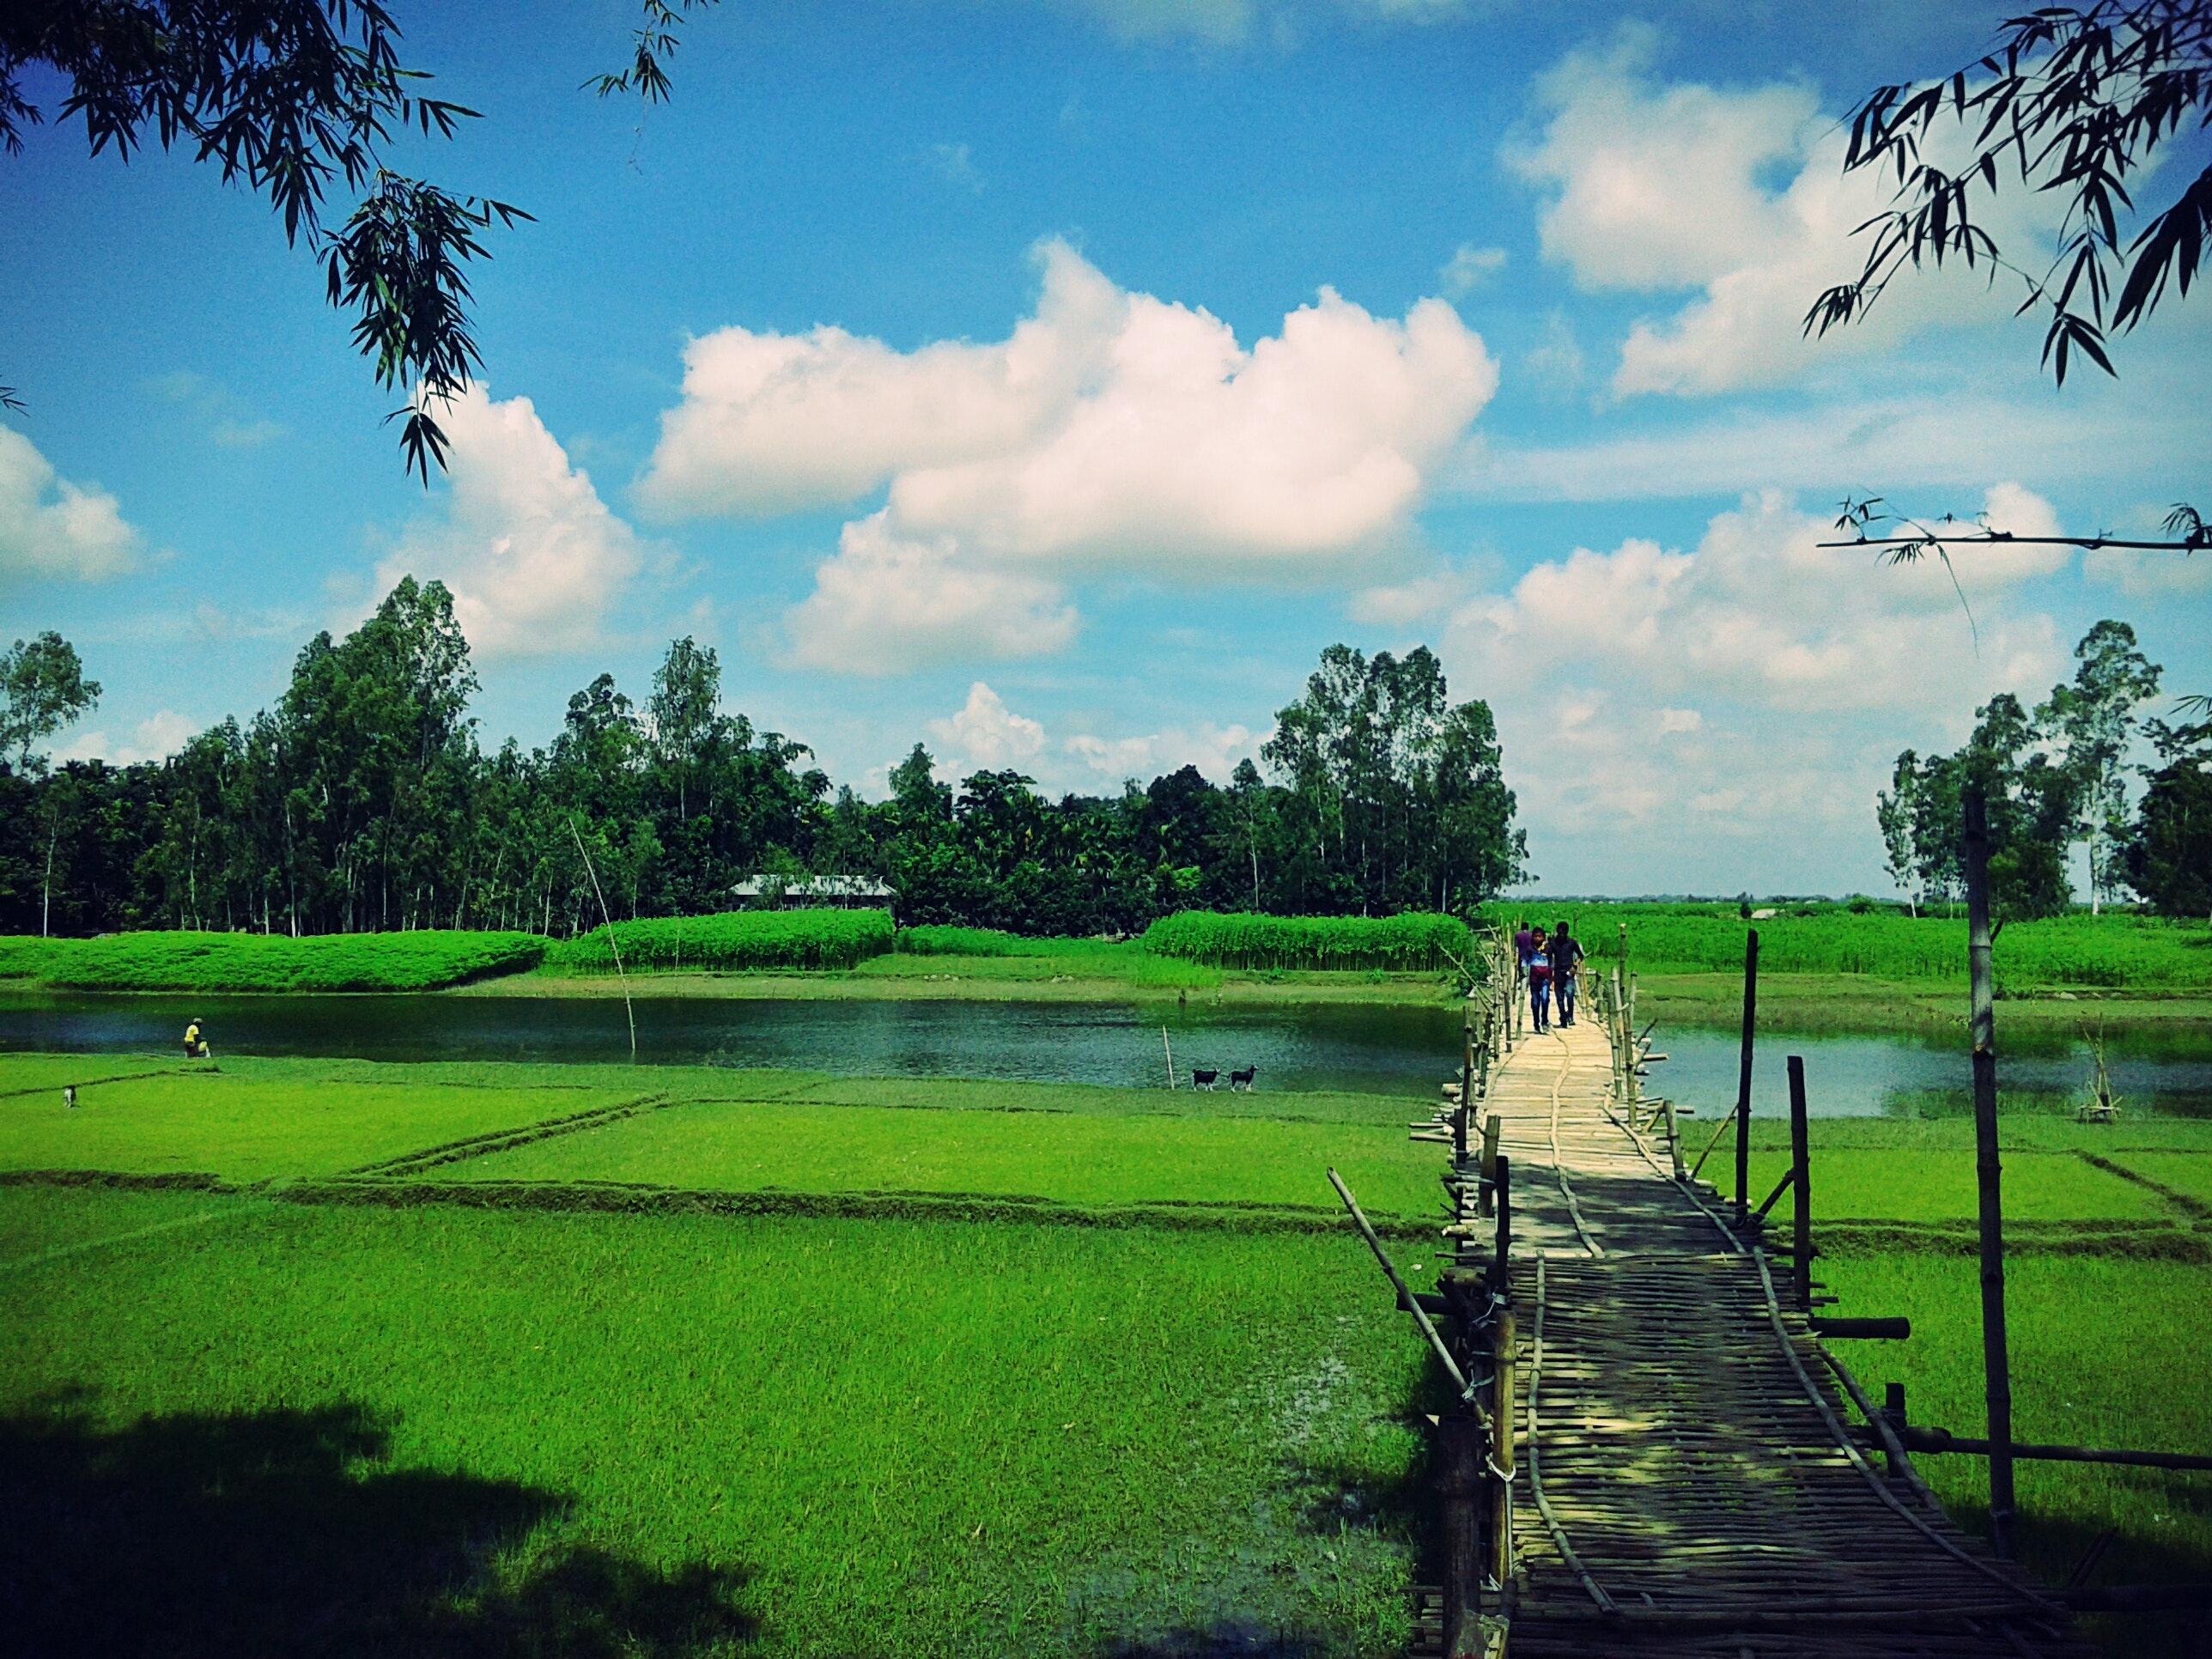 Scenic view of the farm photo